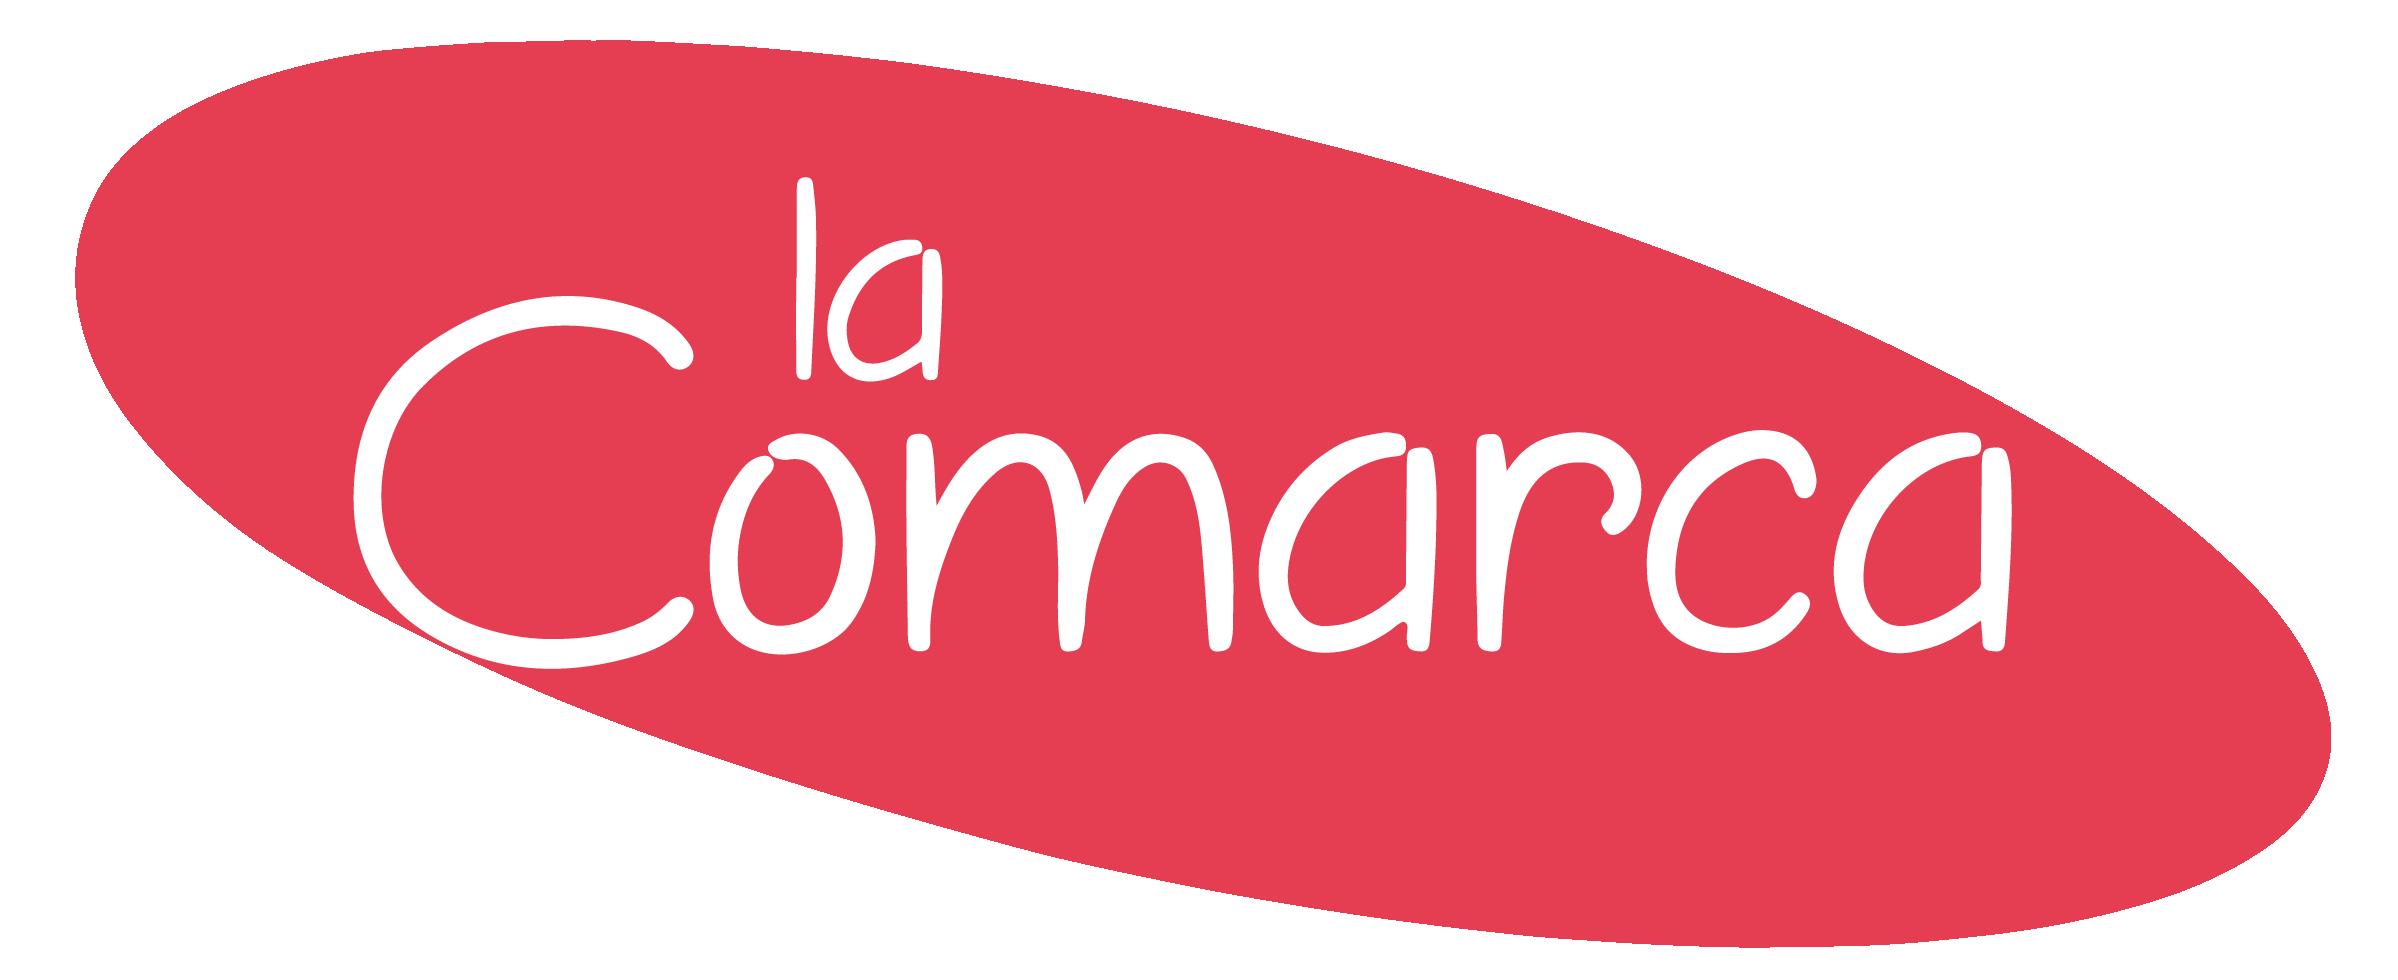 La Comarca Canaria